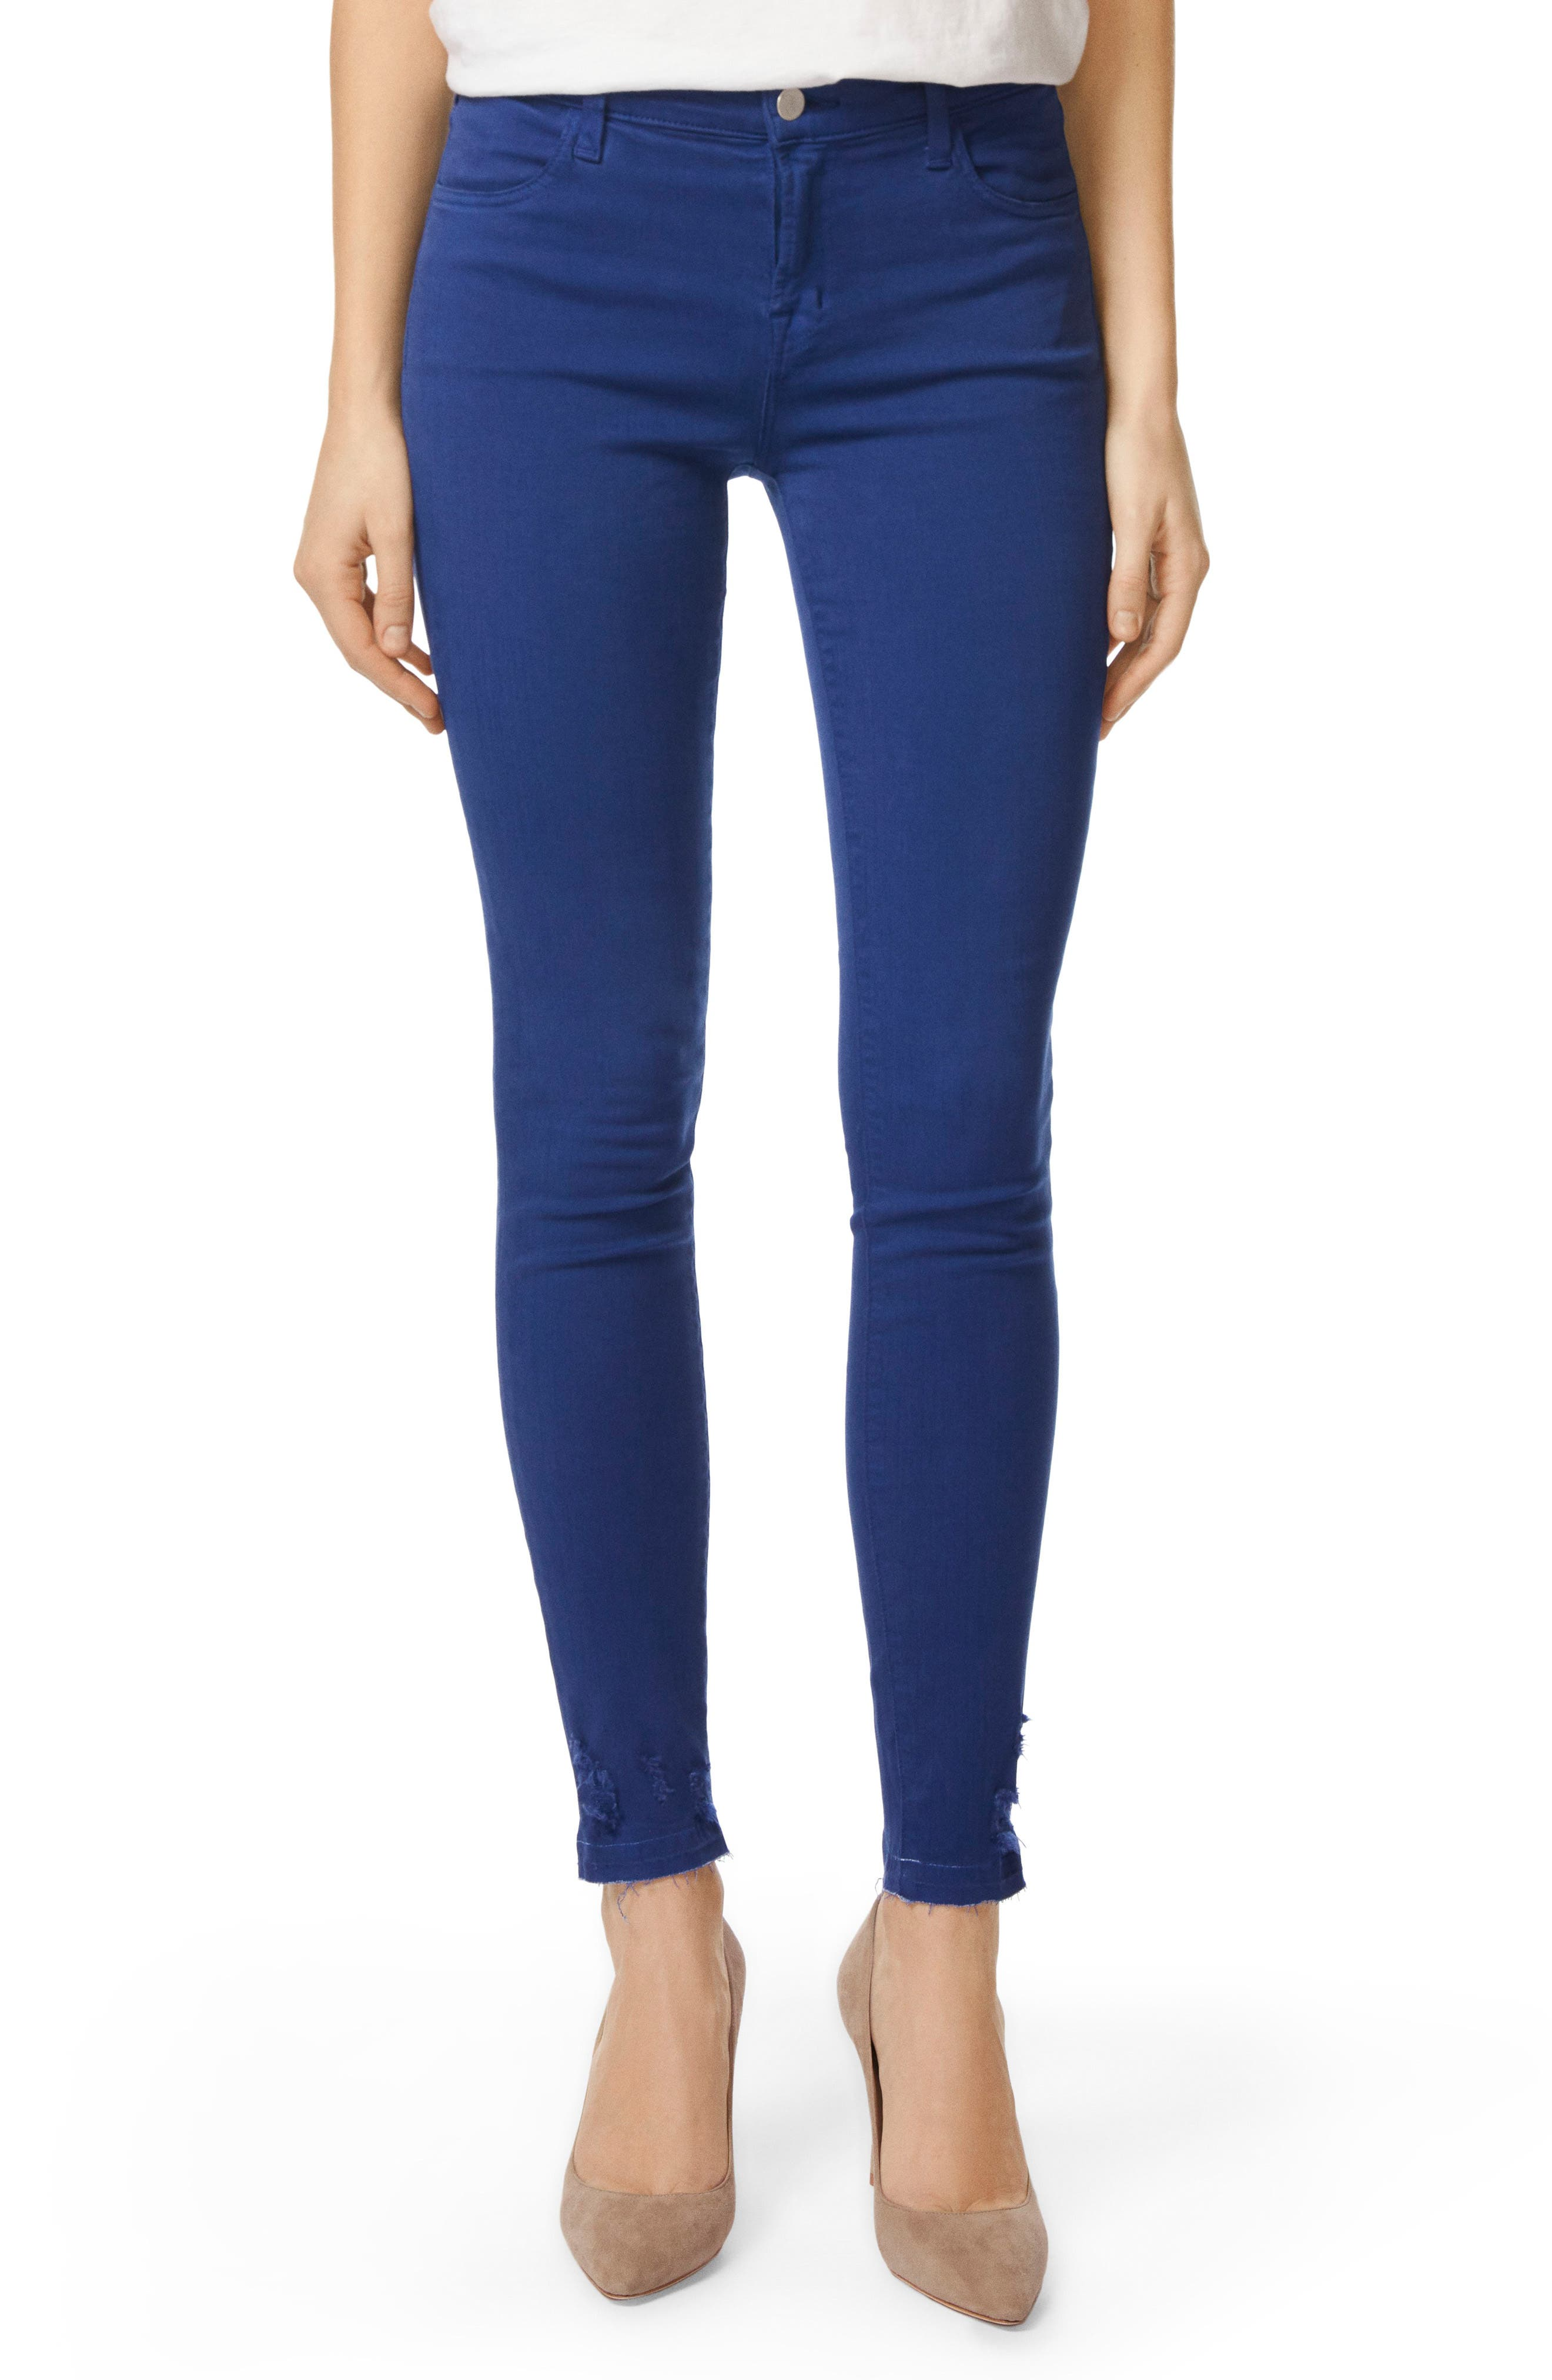 620 Mid Rise Super Skinny Jeans,                         Main,                         color, Electric Sea Destruct